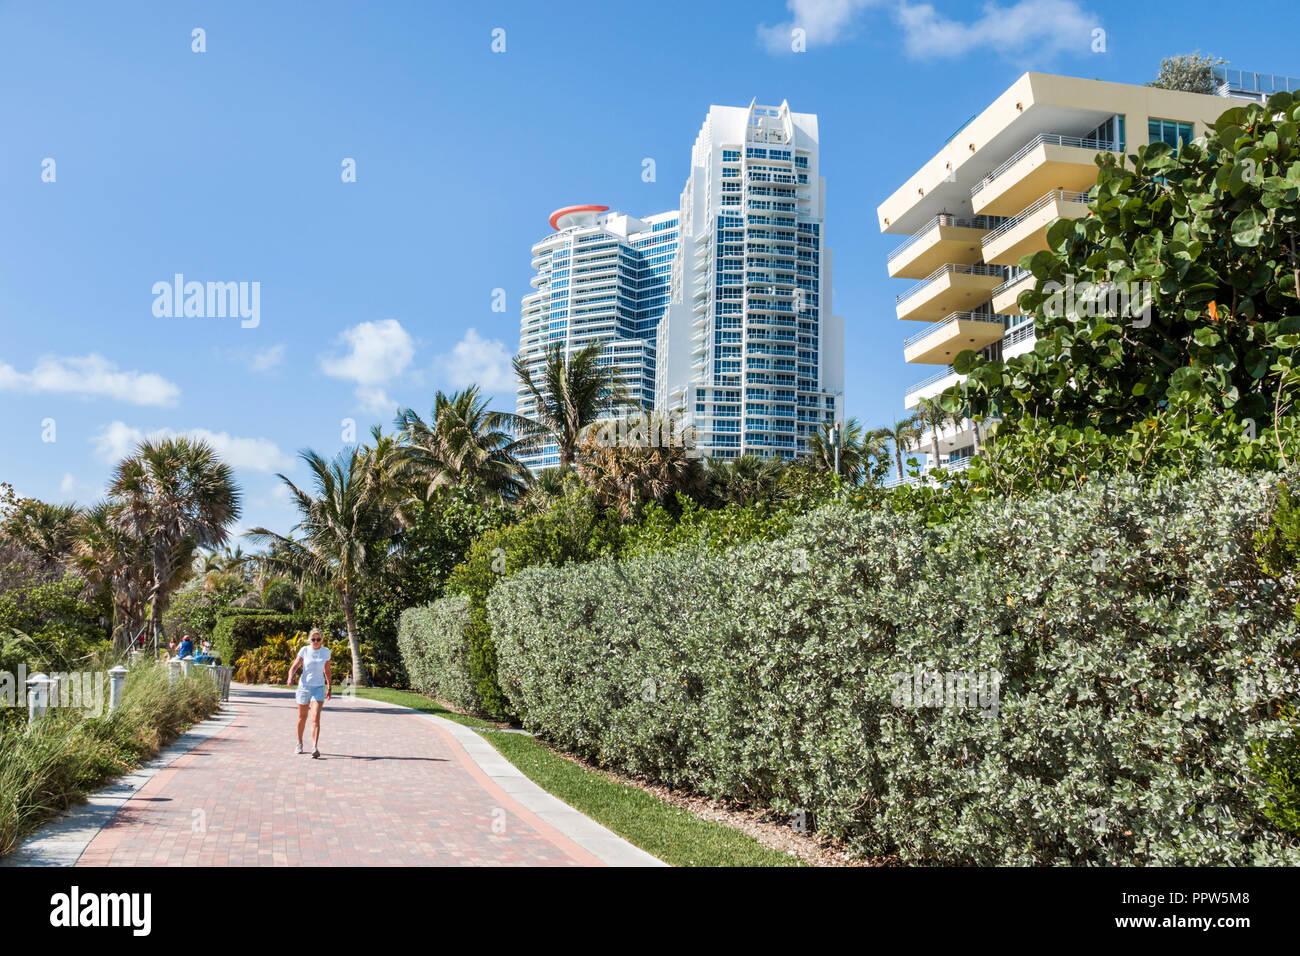 Miami Beach Florida South Pointe BeachWalk walk woman exercising Continuum high rise luxury condominium building buildings - Stock Image